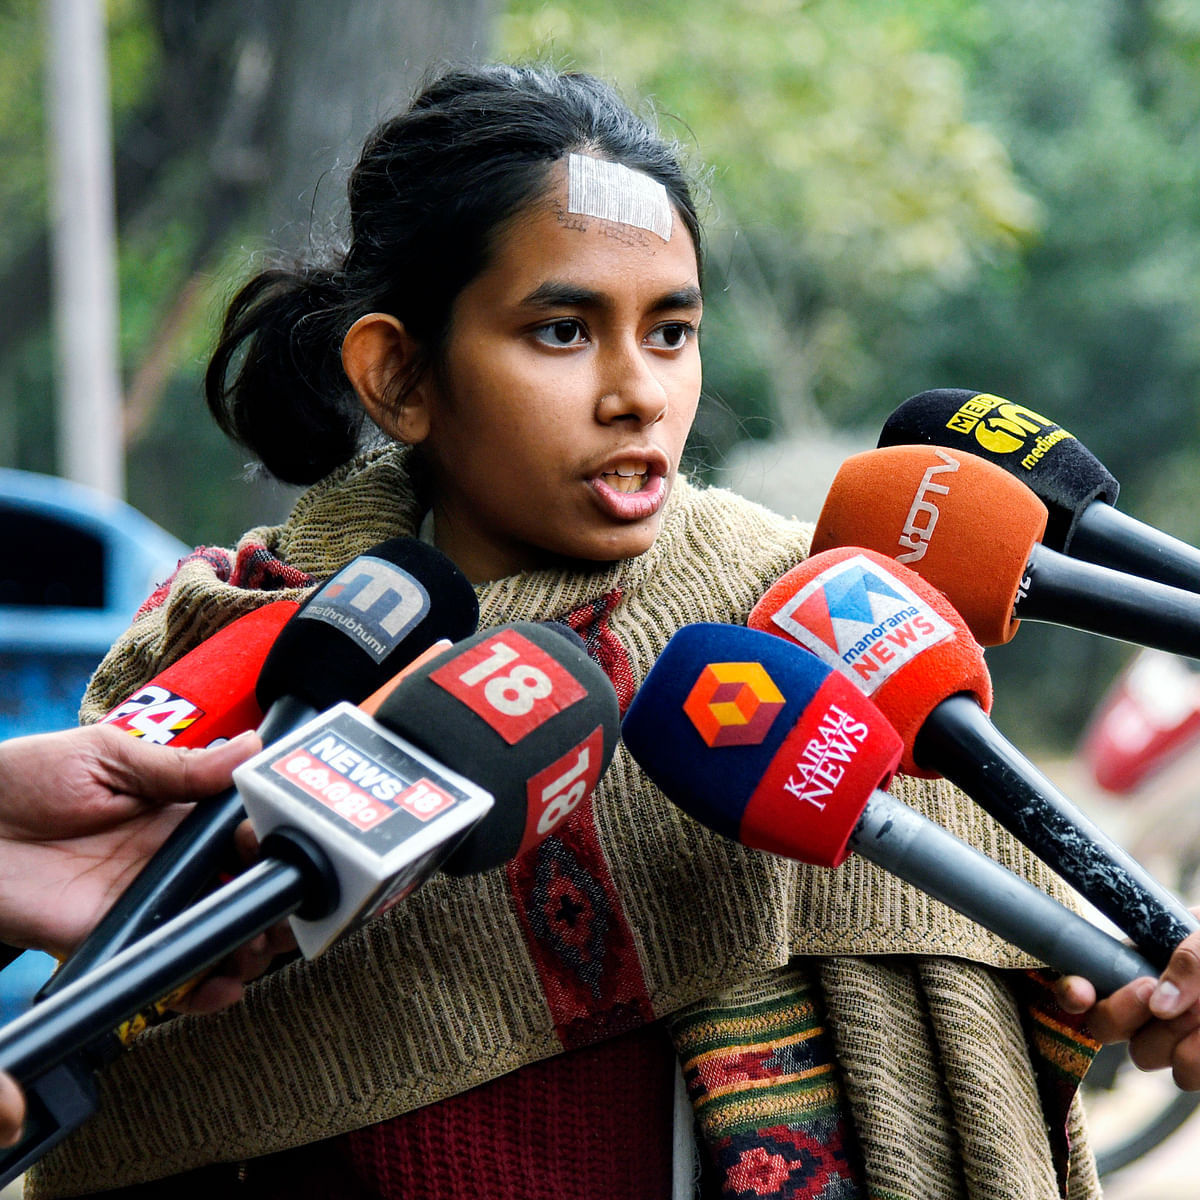 JNU violence: Delhi Police questions JNUSU president Aishe Ghosh, 2 others